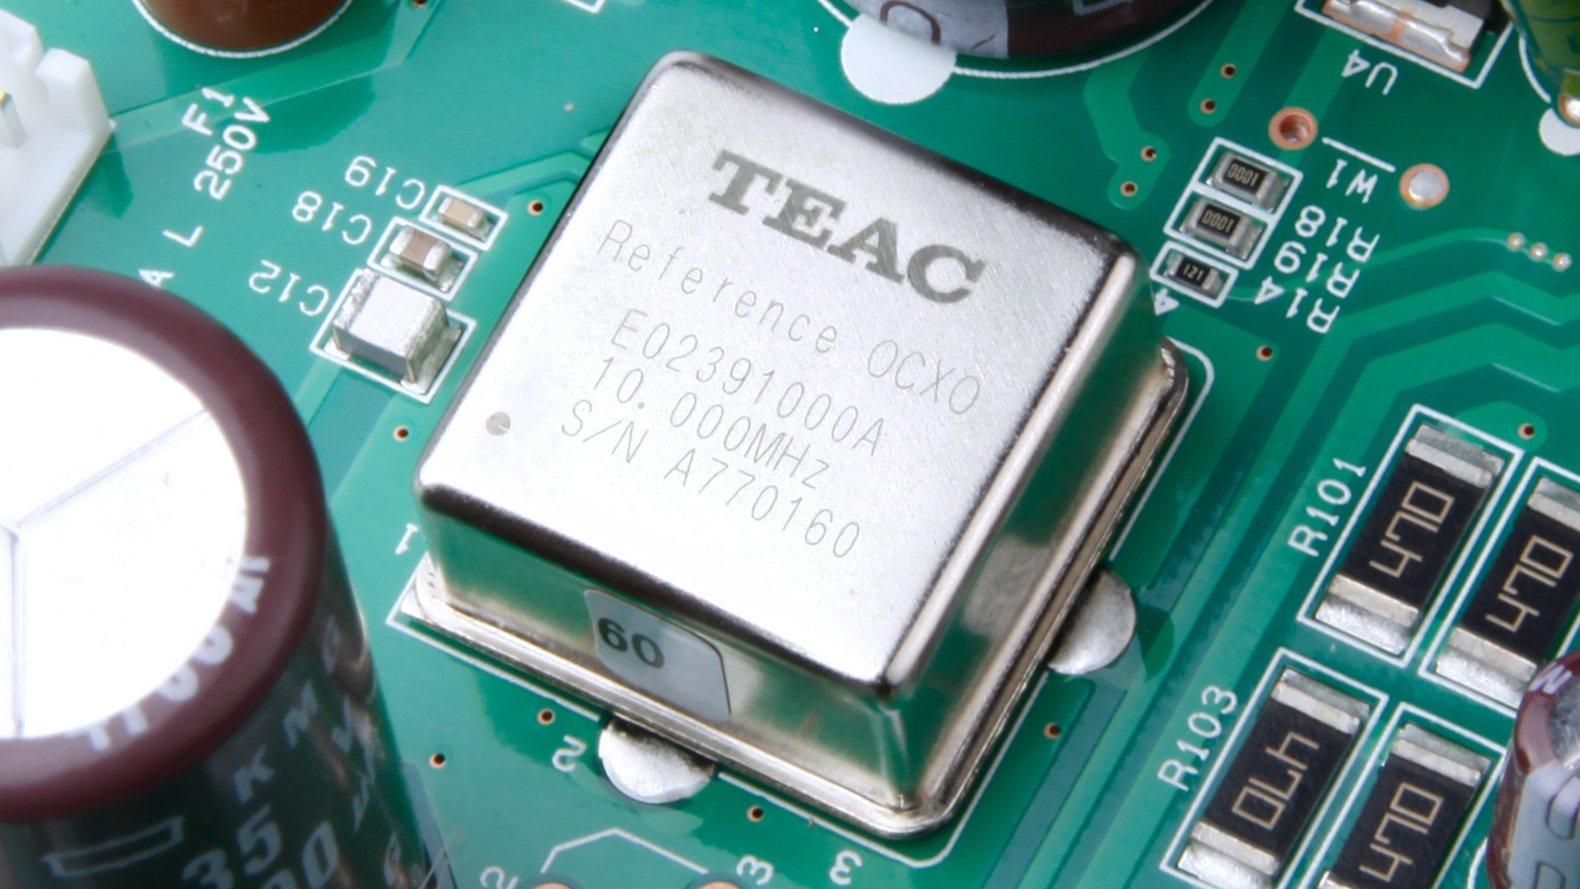 1123_teac_nt_505_cg_10m_12.jpg